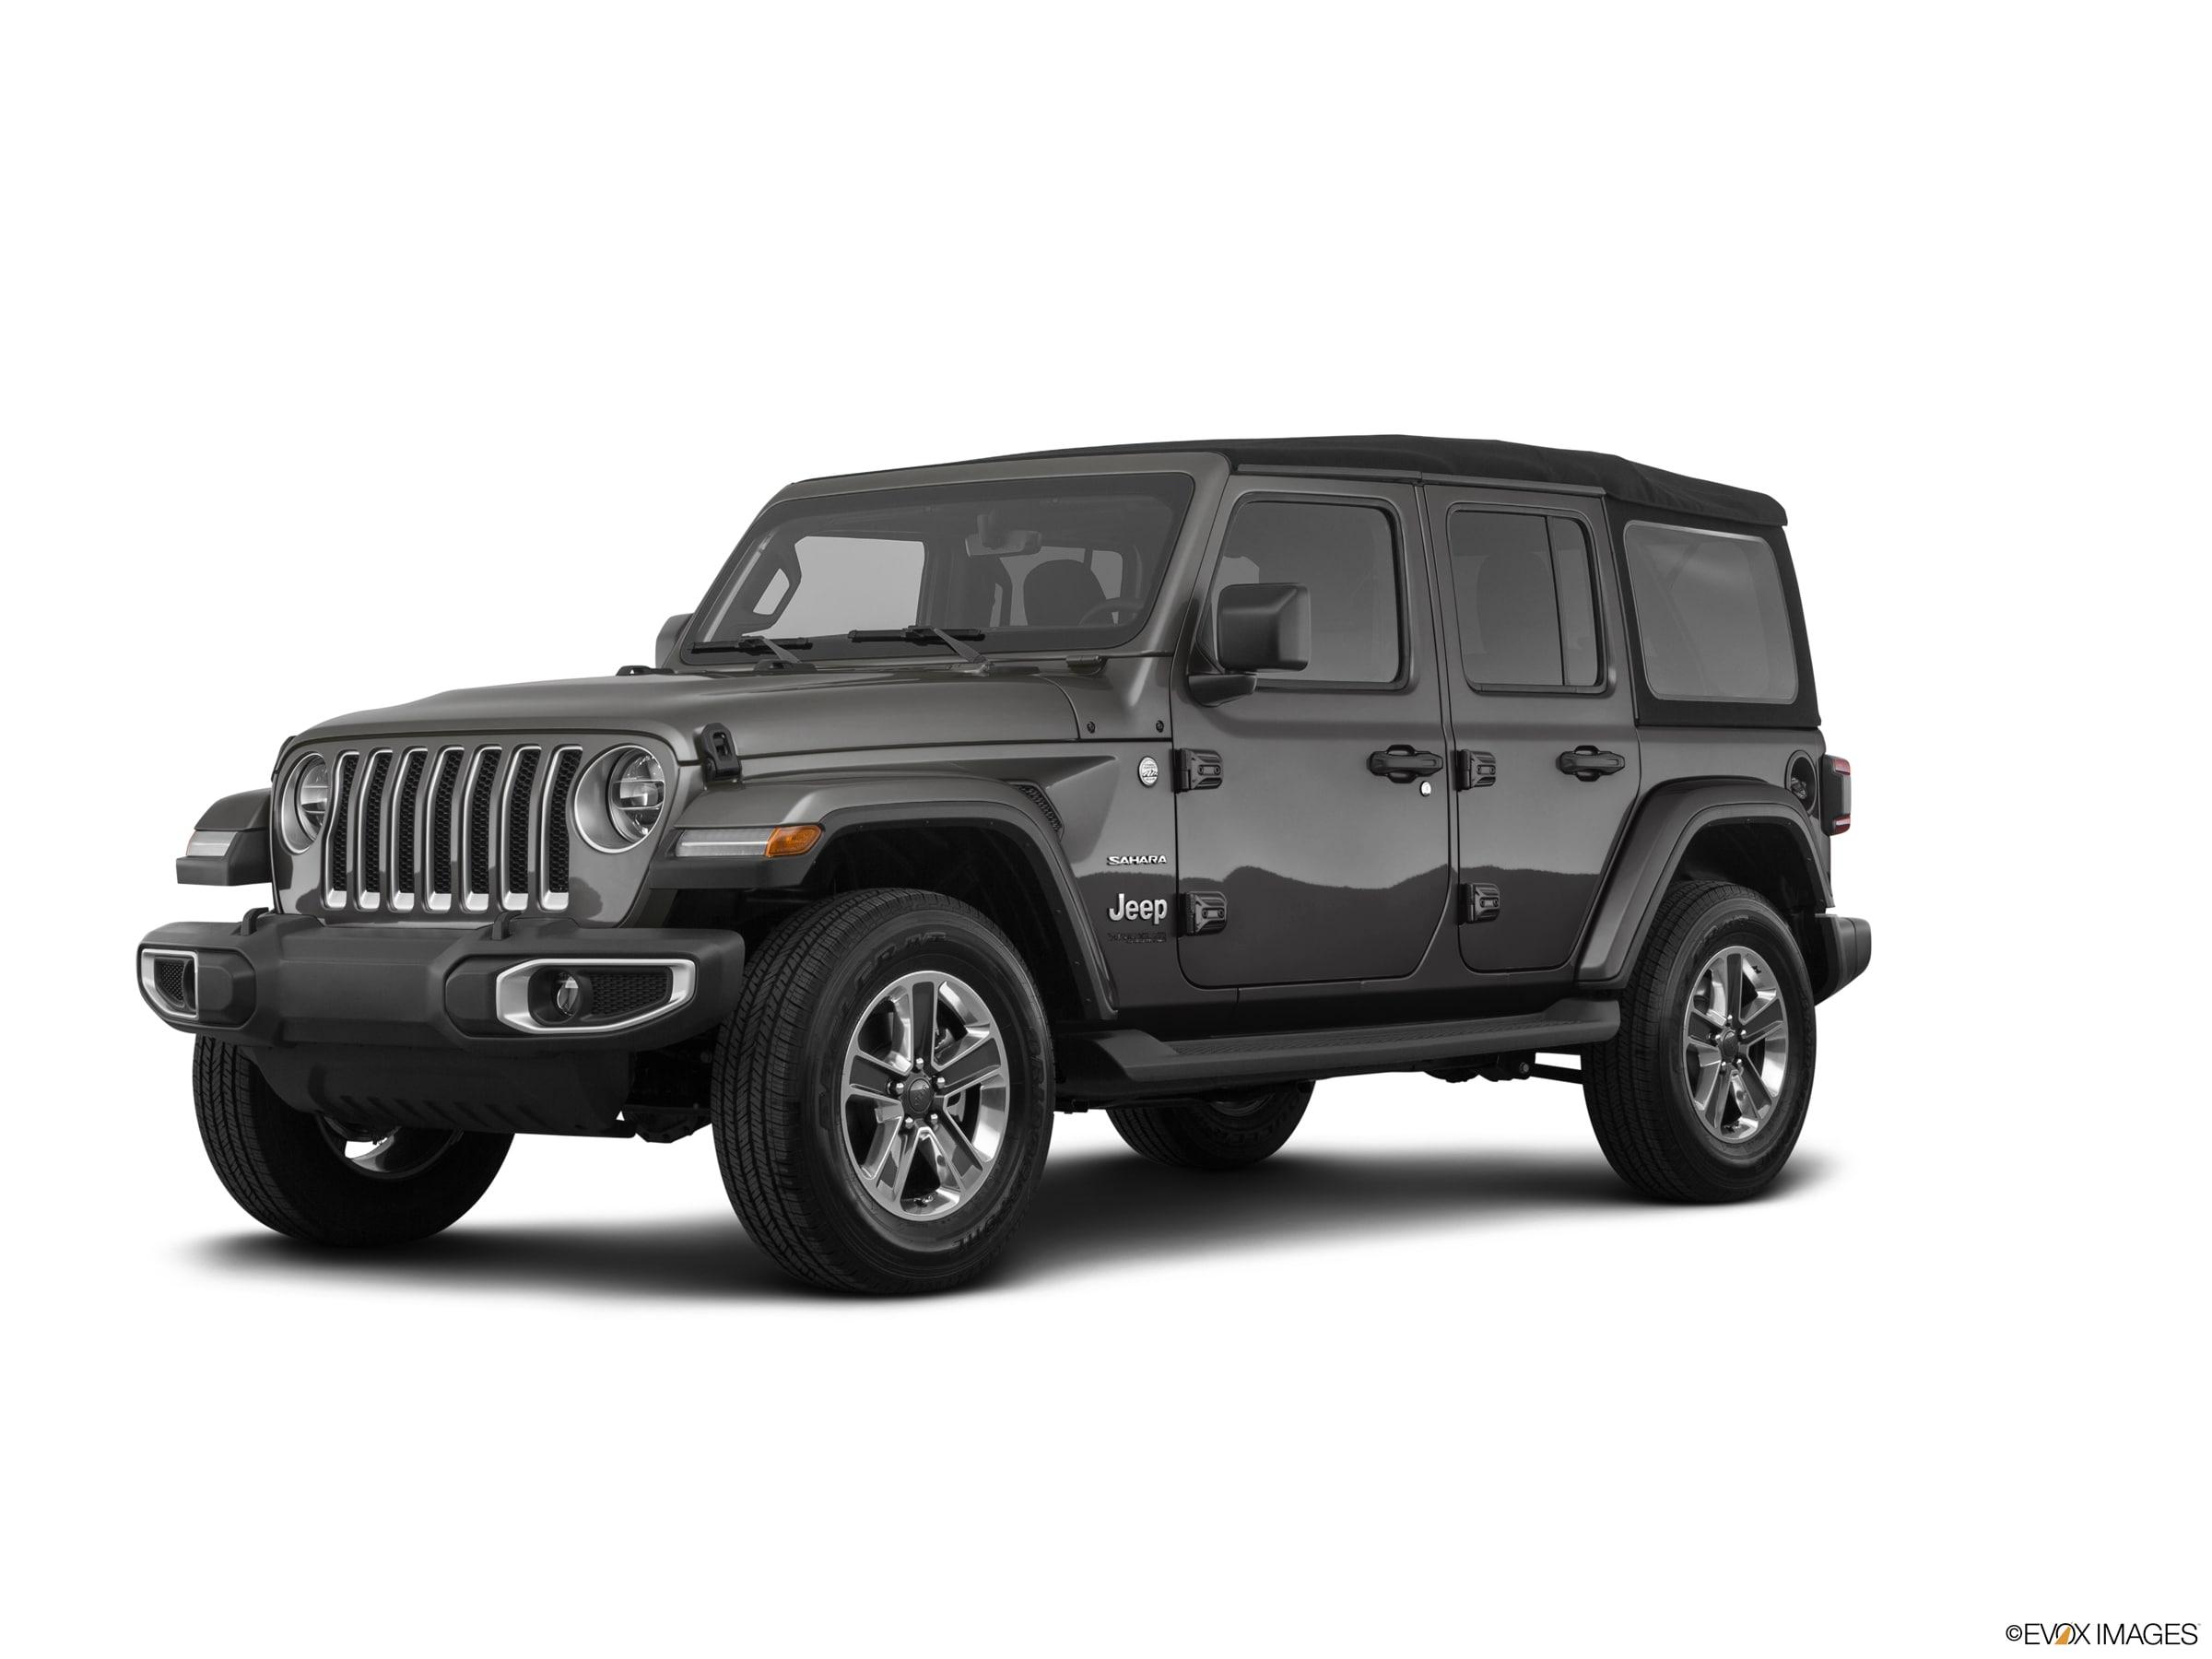 2020 Jeep Wrangler Unlimited For Sale In El Paso Tx Dick Poe